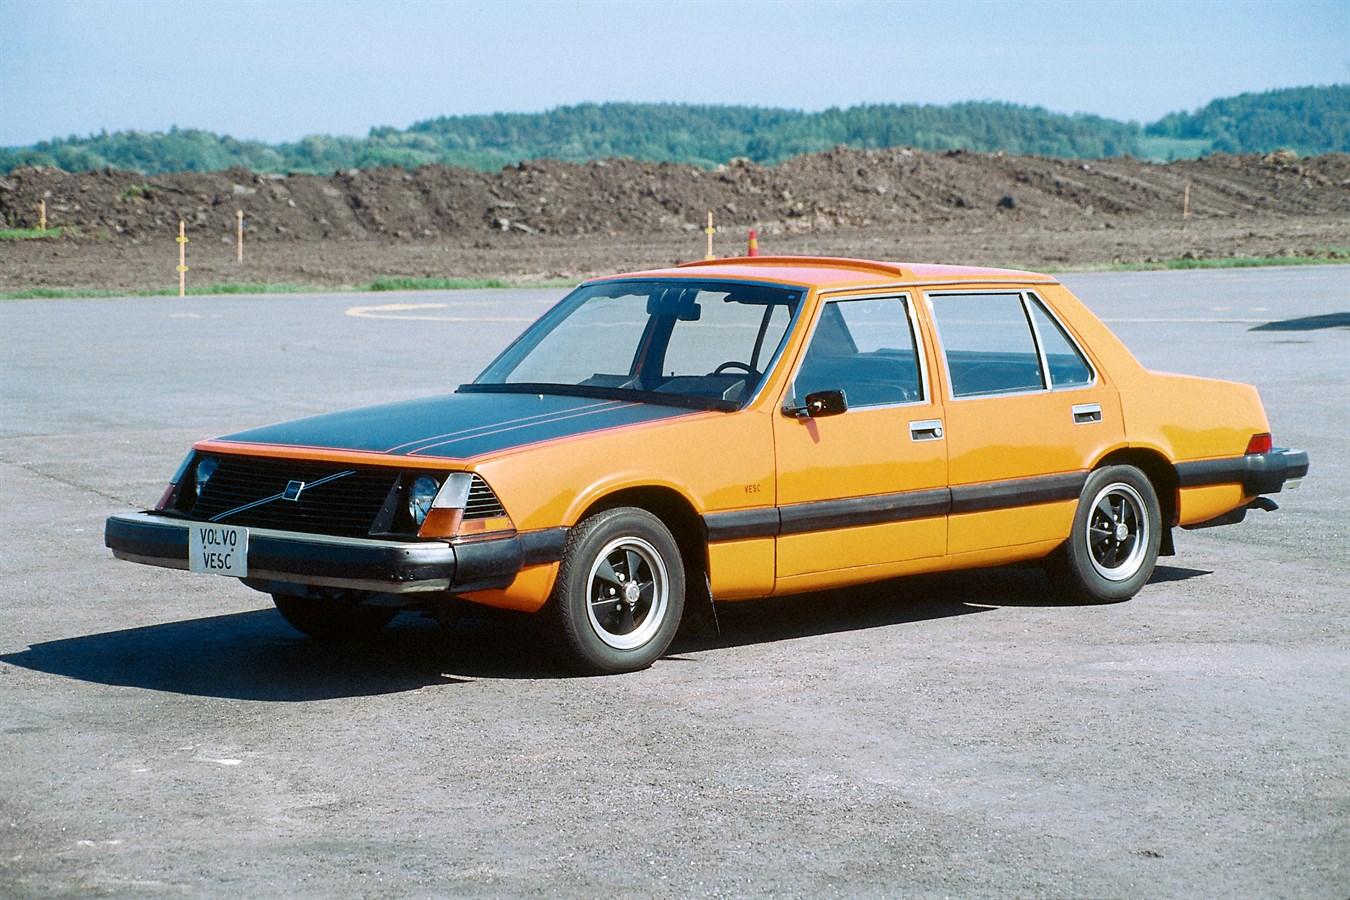 Volvos Konceptbilar Del Av Genomtankt Strategi Volvo Car Sverige Ab Newsroom